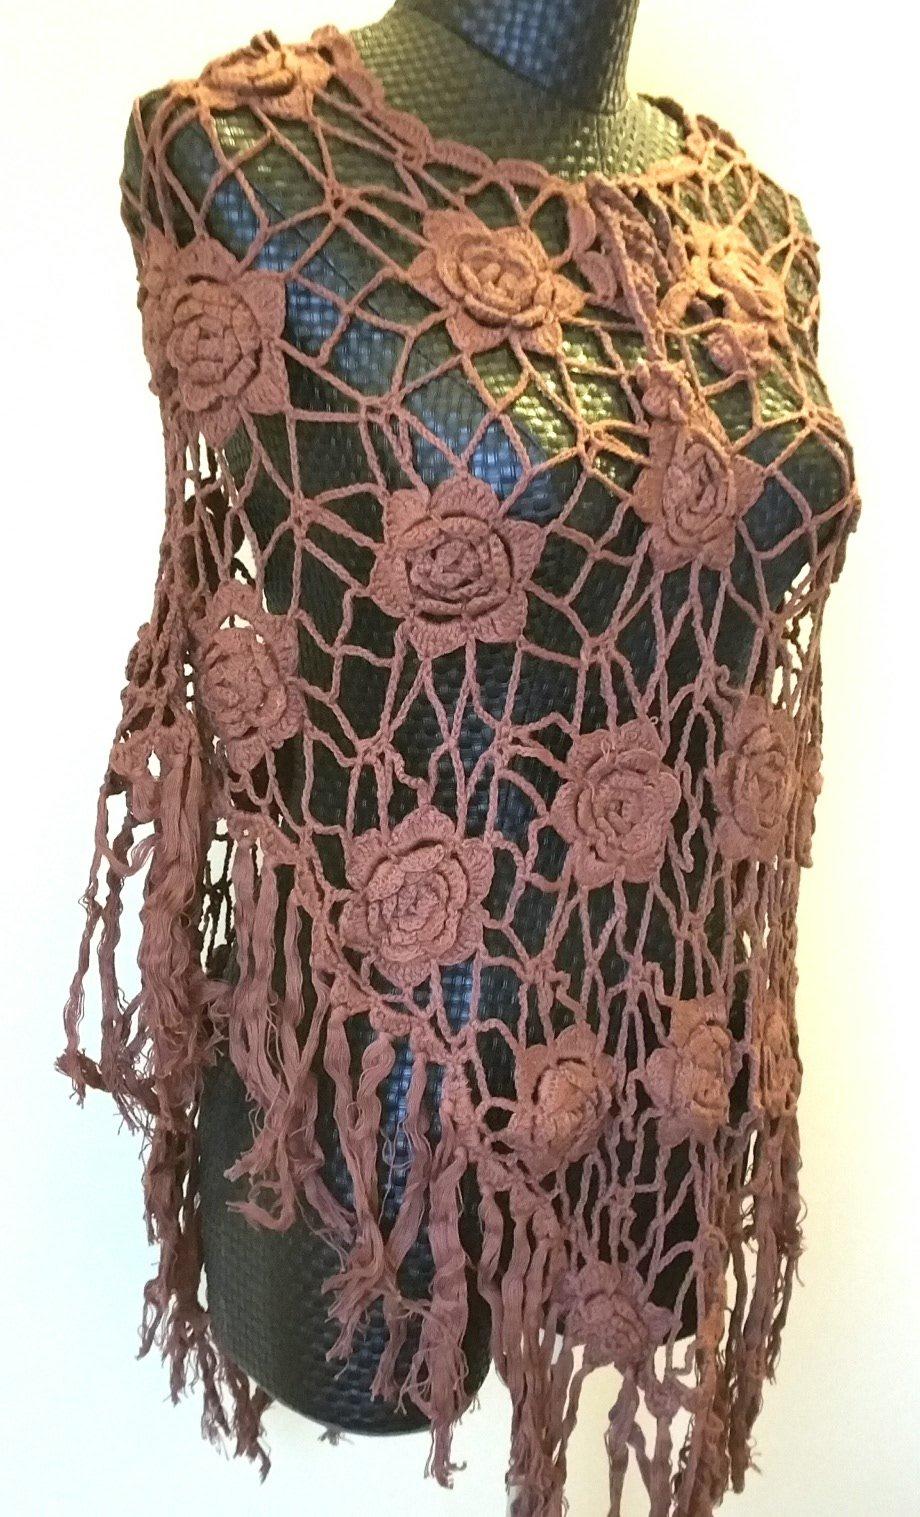 Vintage Loose Knit Crochet Fringe Poncho Swim Cover Pool Drape Top brown by Crochet Poncho (Image #1)